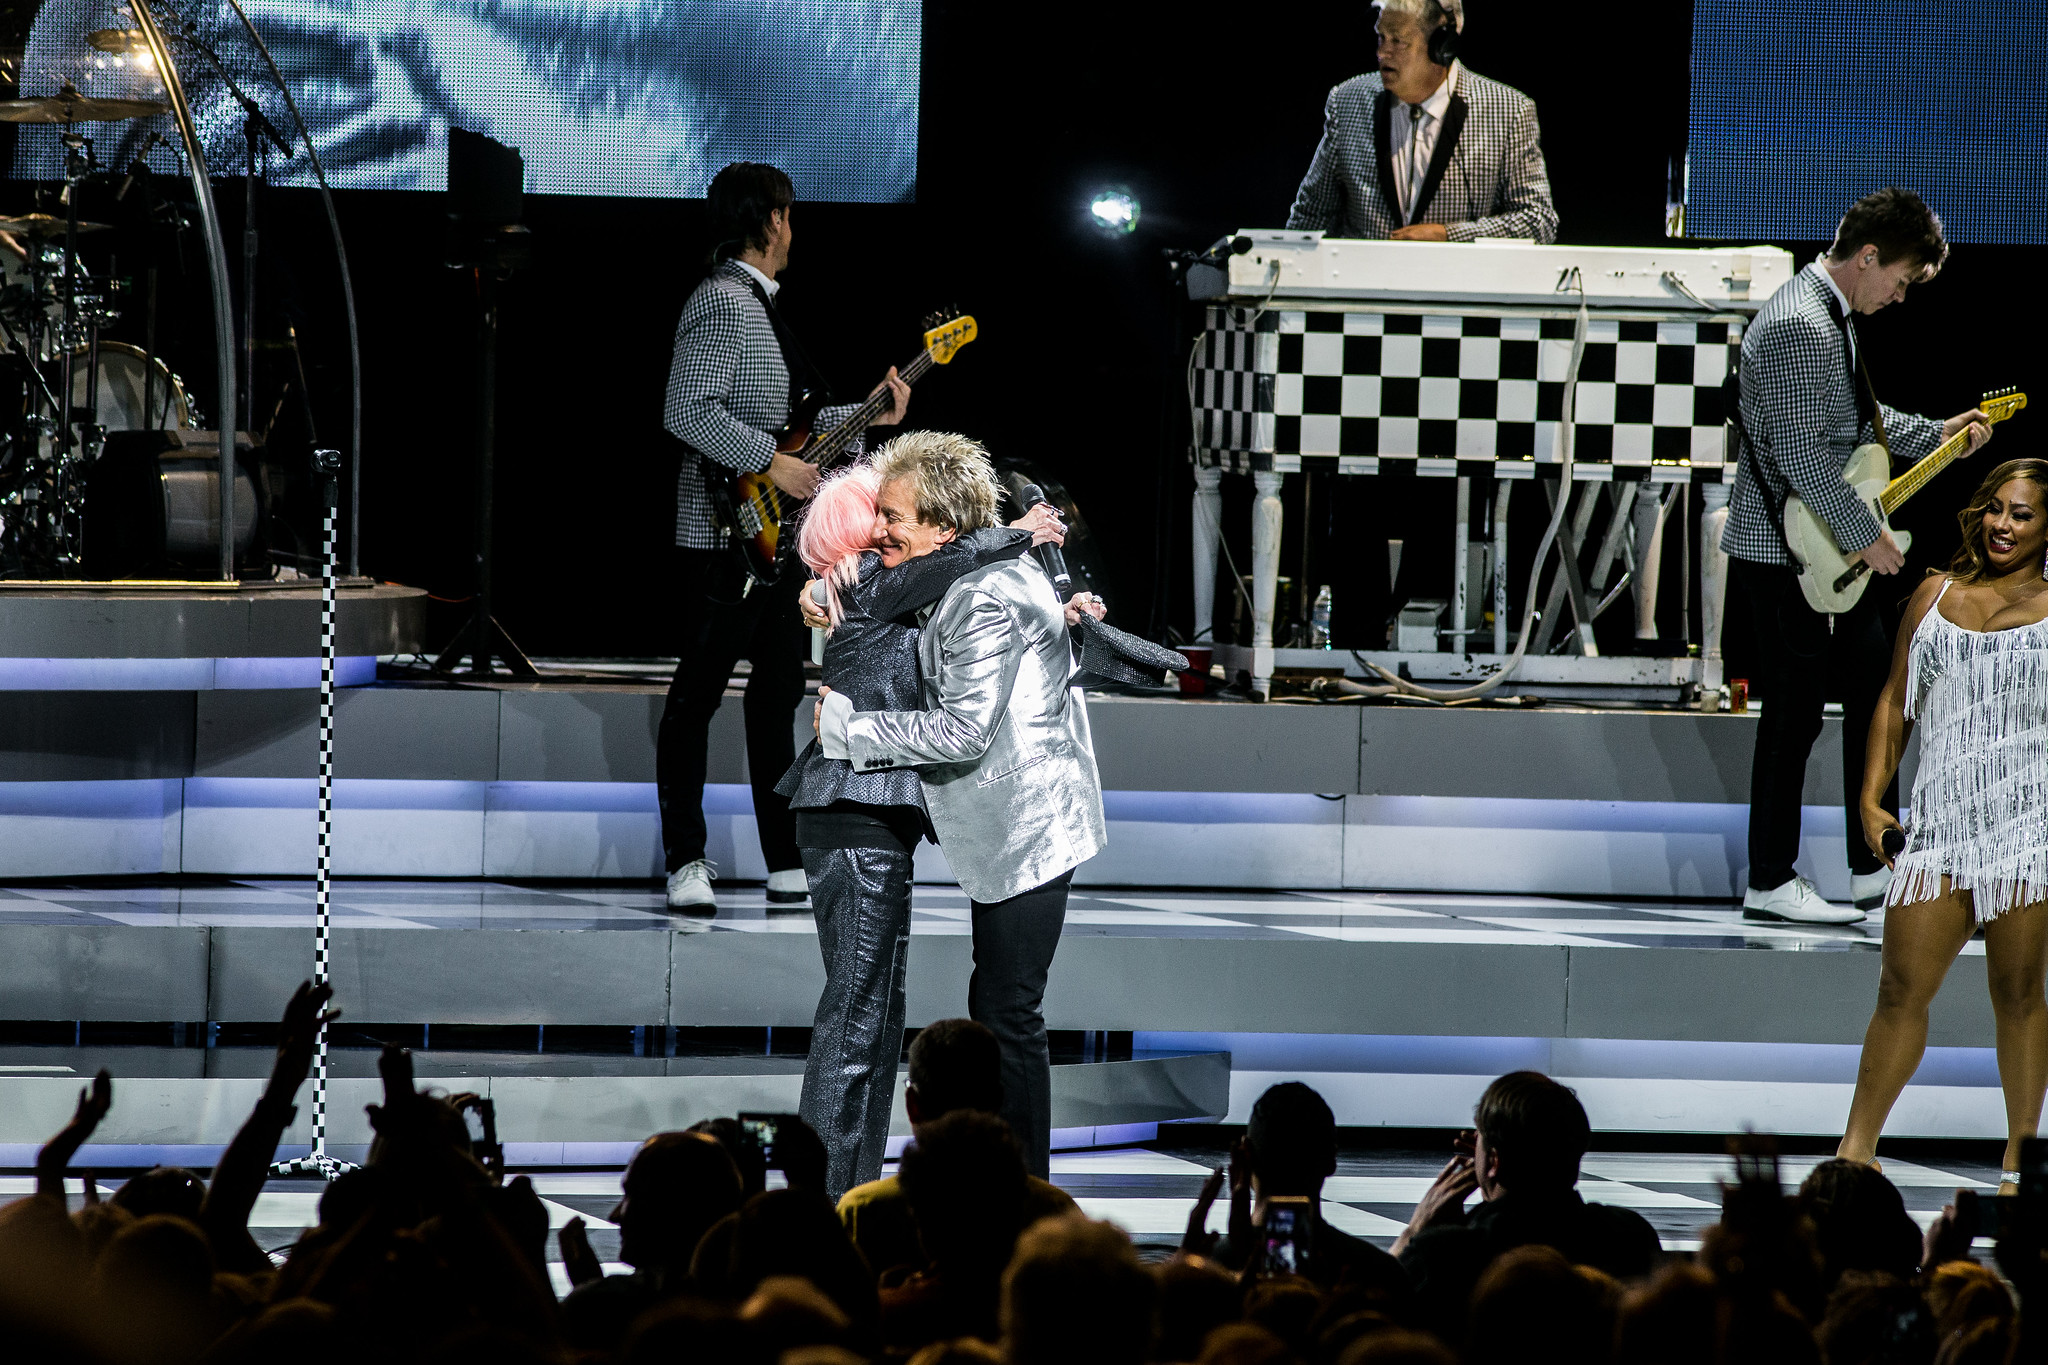 Rod Stewart w/ Cyndi Lauper